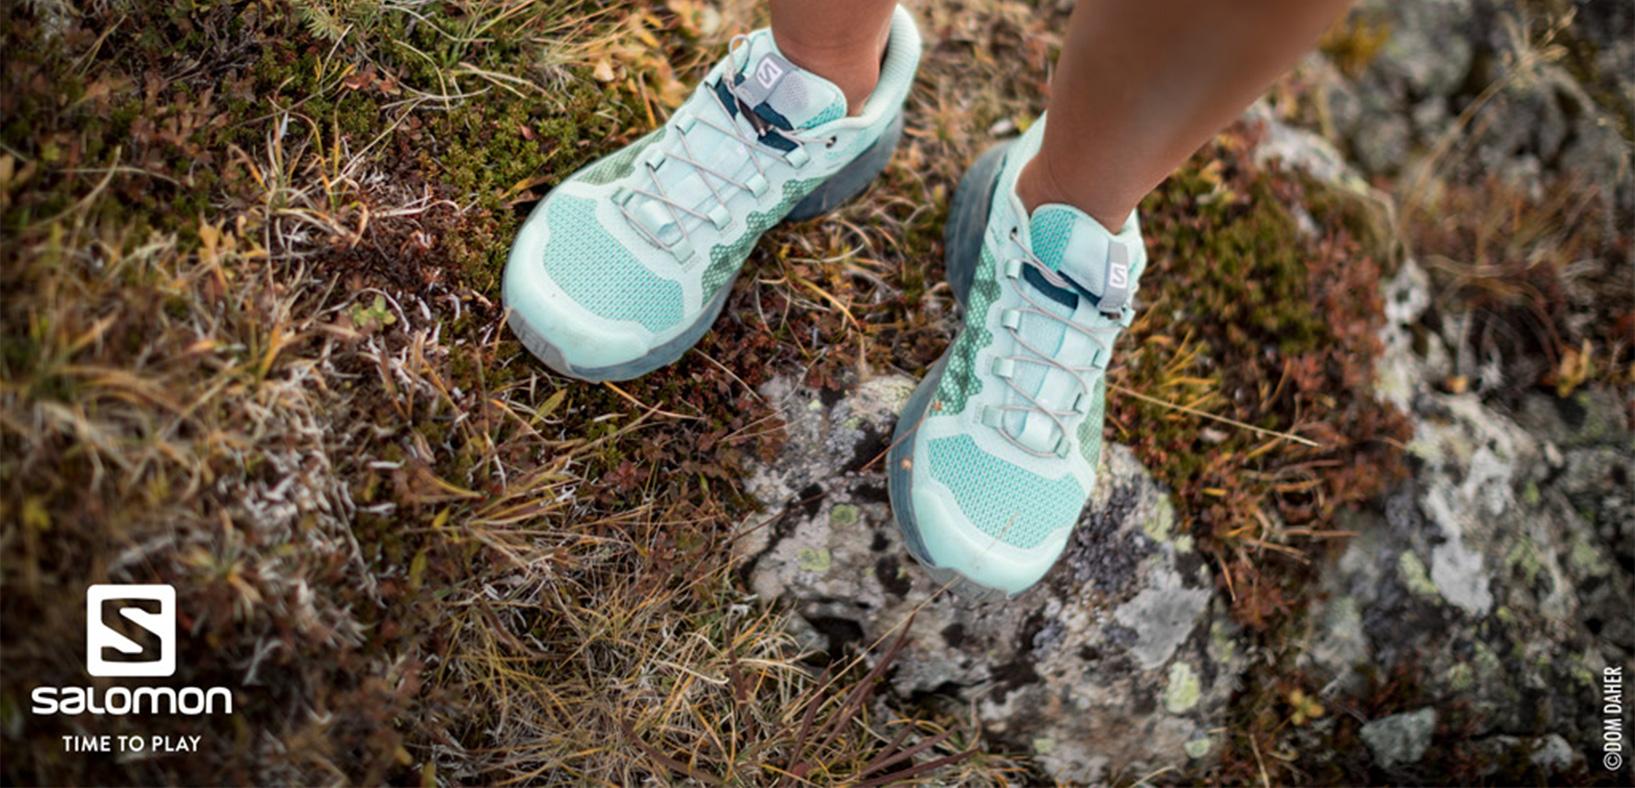 Tout Elevate Xa De Trail Le Salomon Chaussures DeWYIE9H2